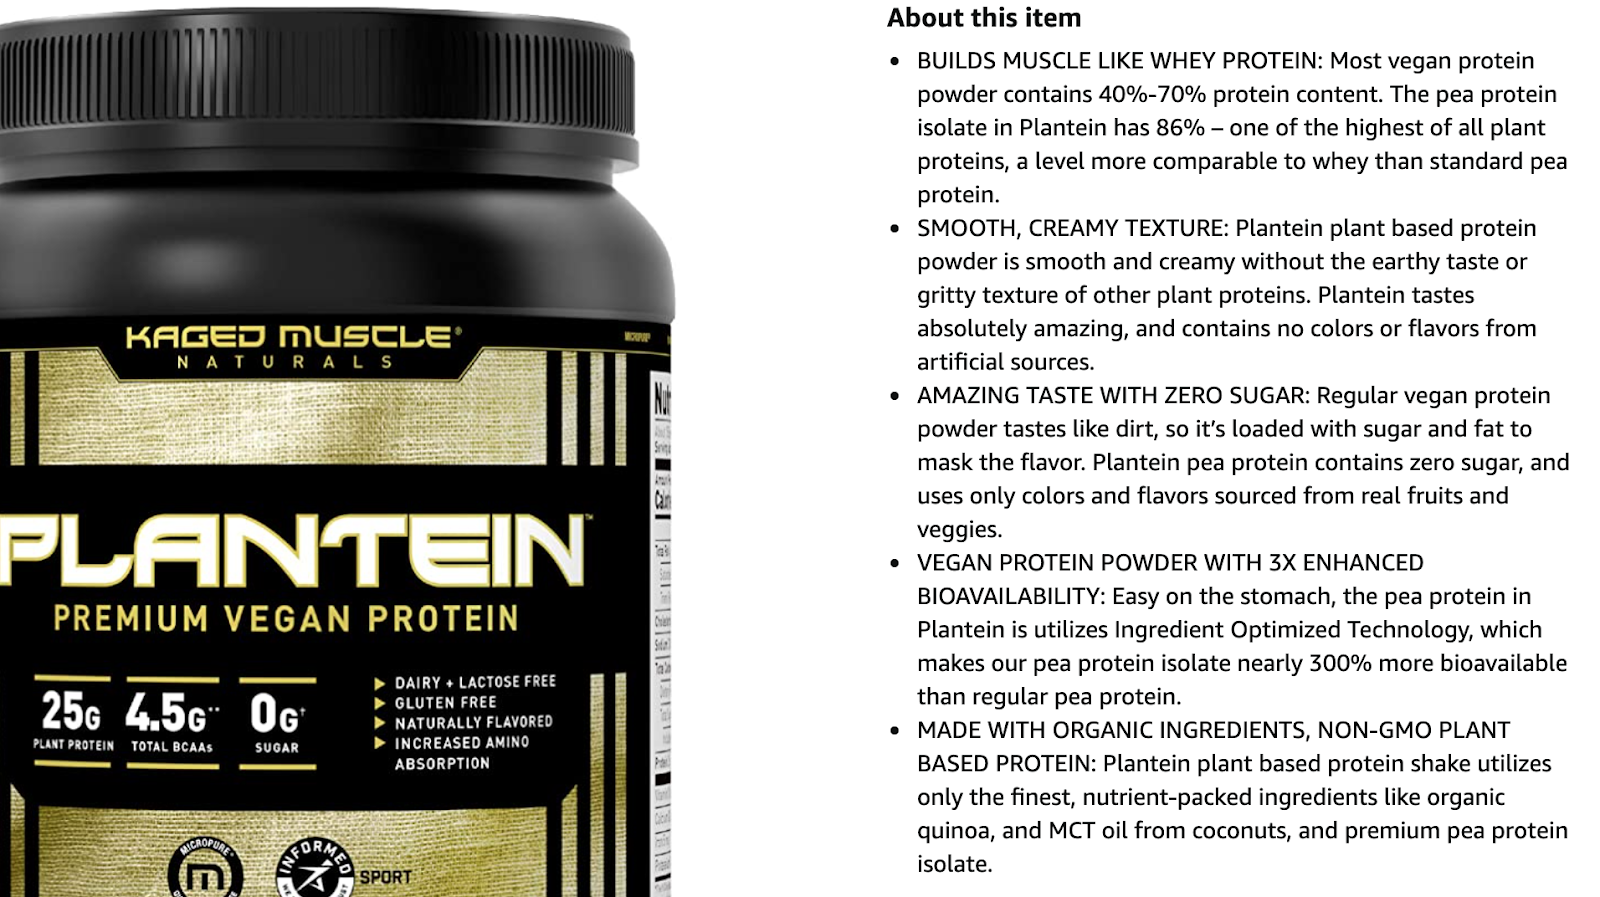 plantein premium vegan protein